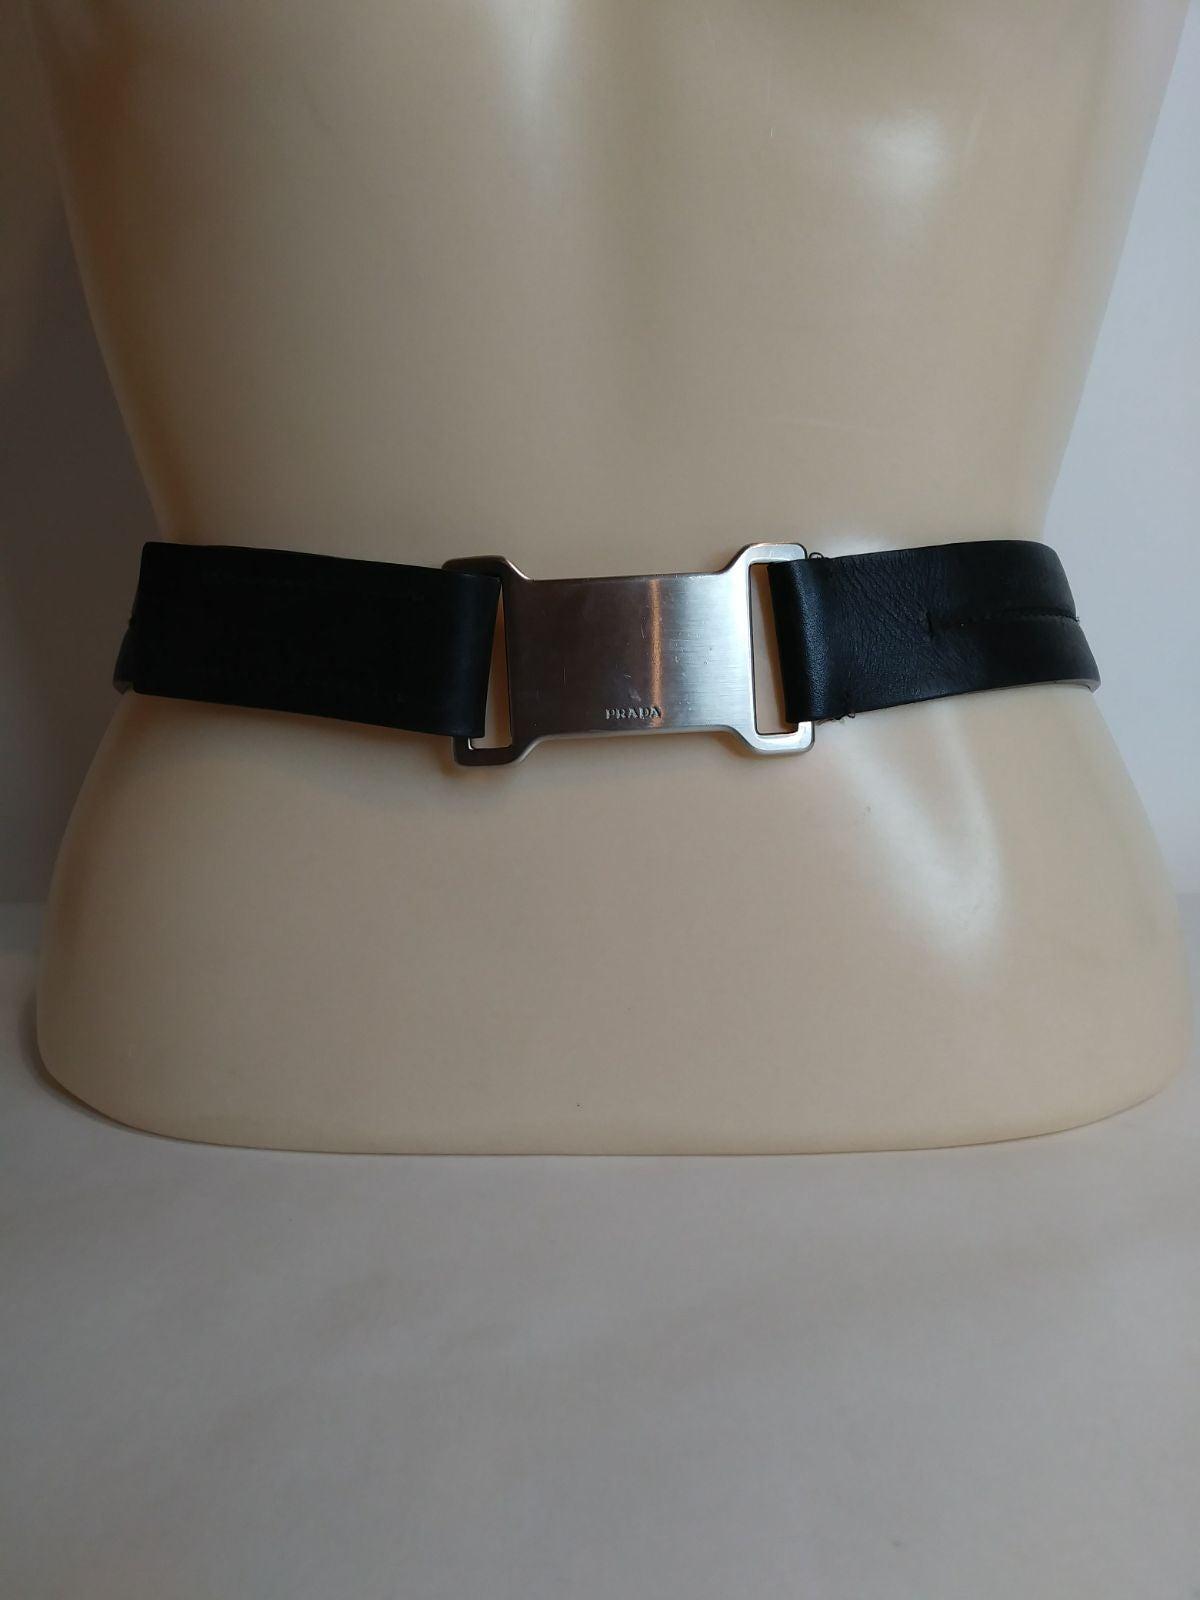 Prada Black Leather Belt 30 Silver Buckl